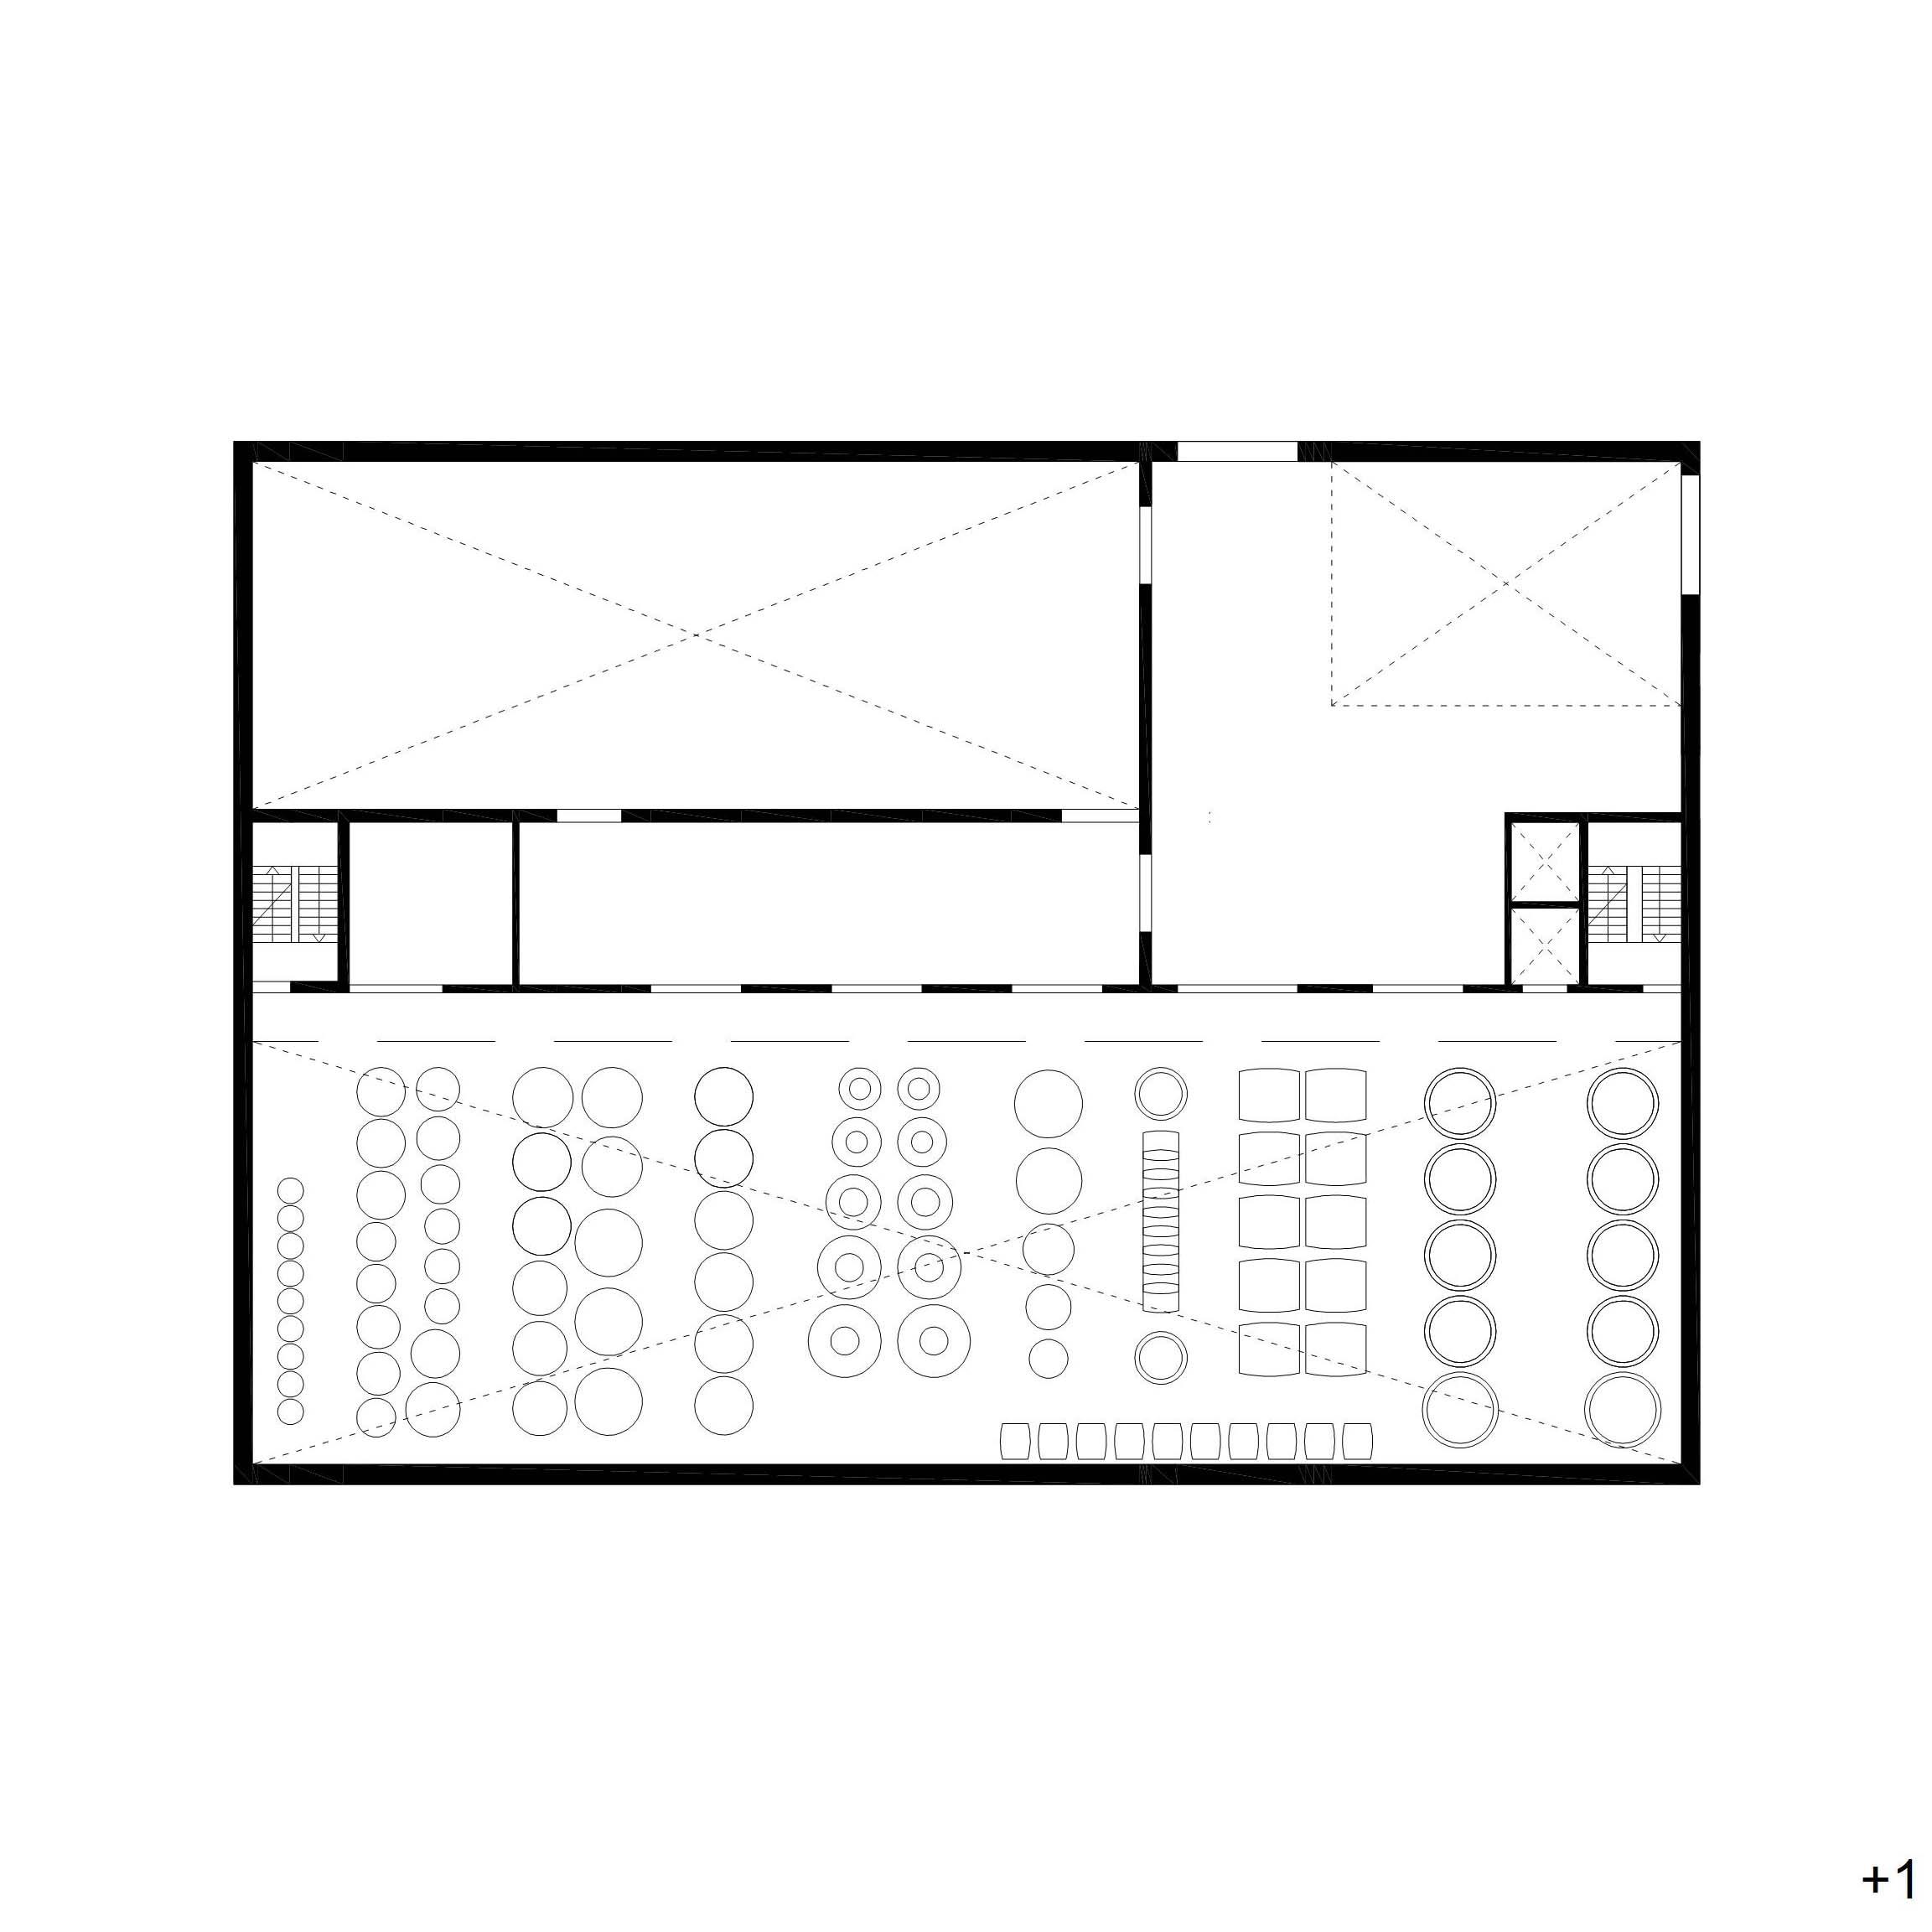 plan 1st floor dva arhitekta}